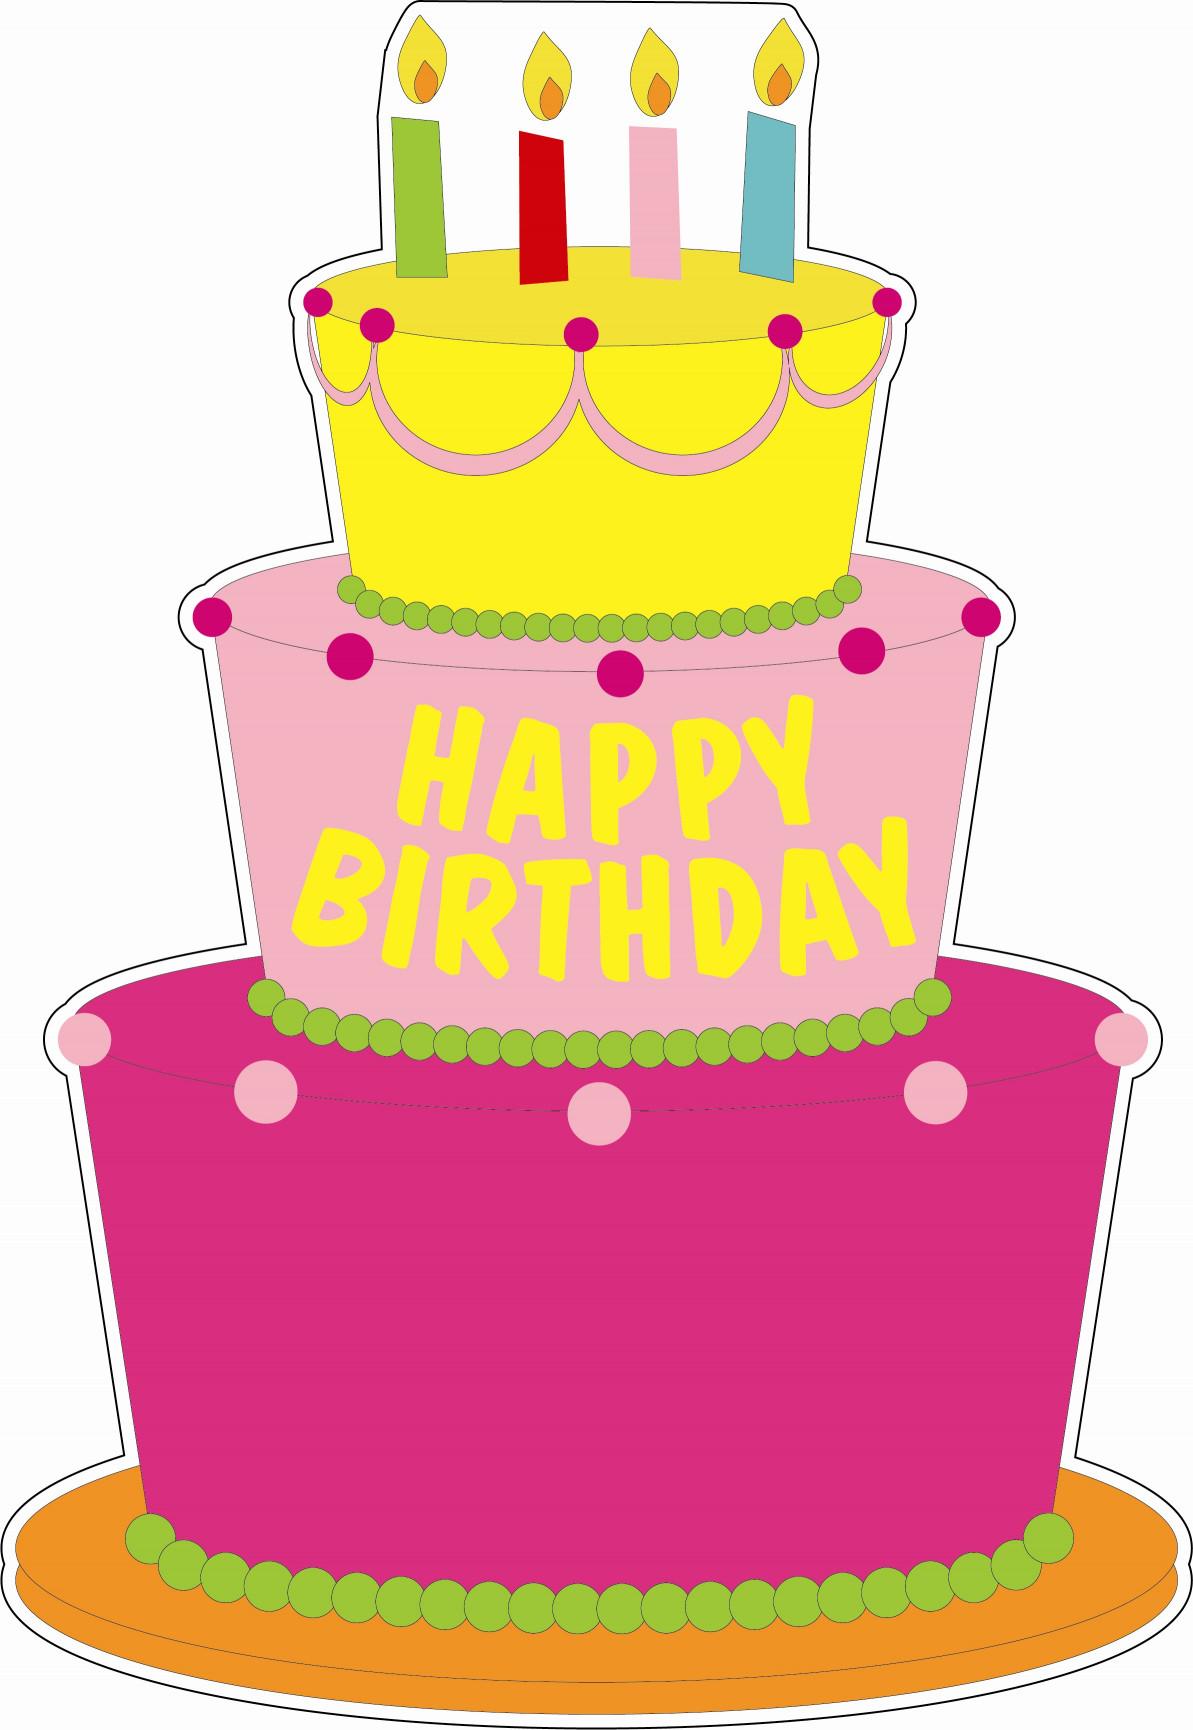 Birthday Cake Cartoon  VA Lawn Greetings VA Yard Cards Virginia Birthday Signs